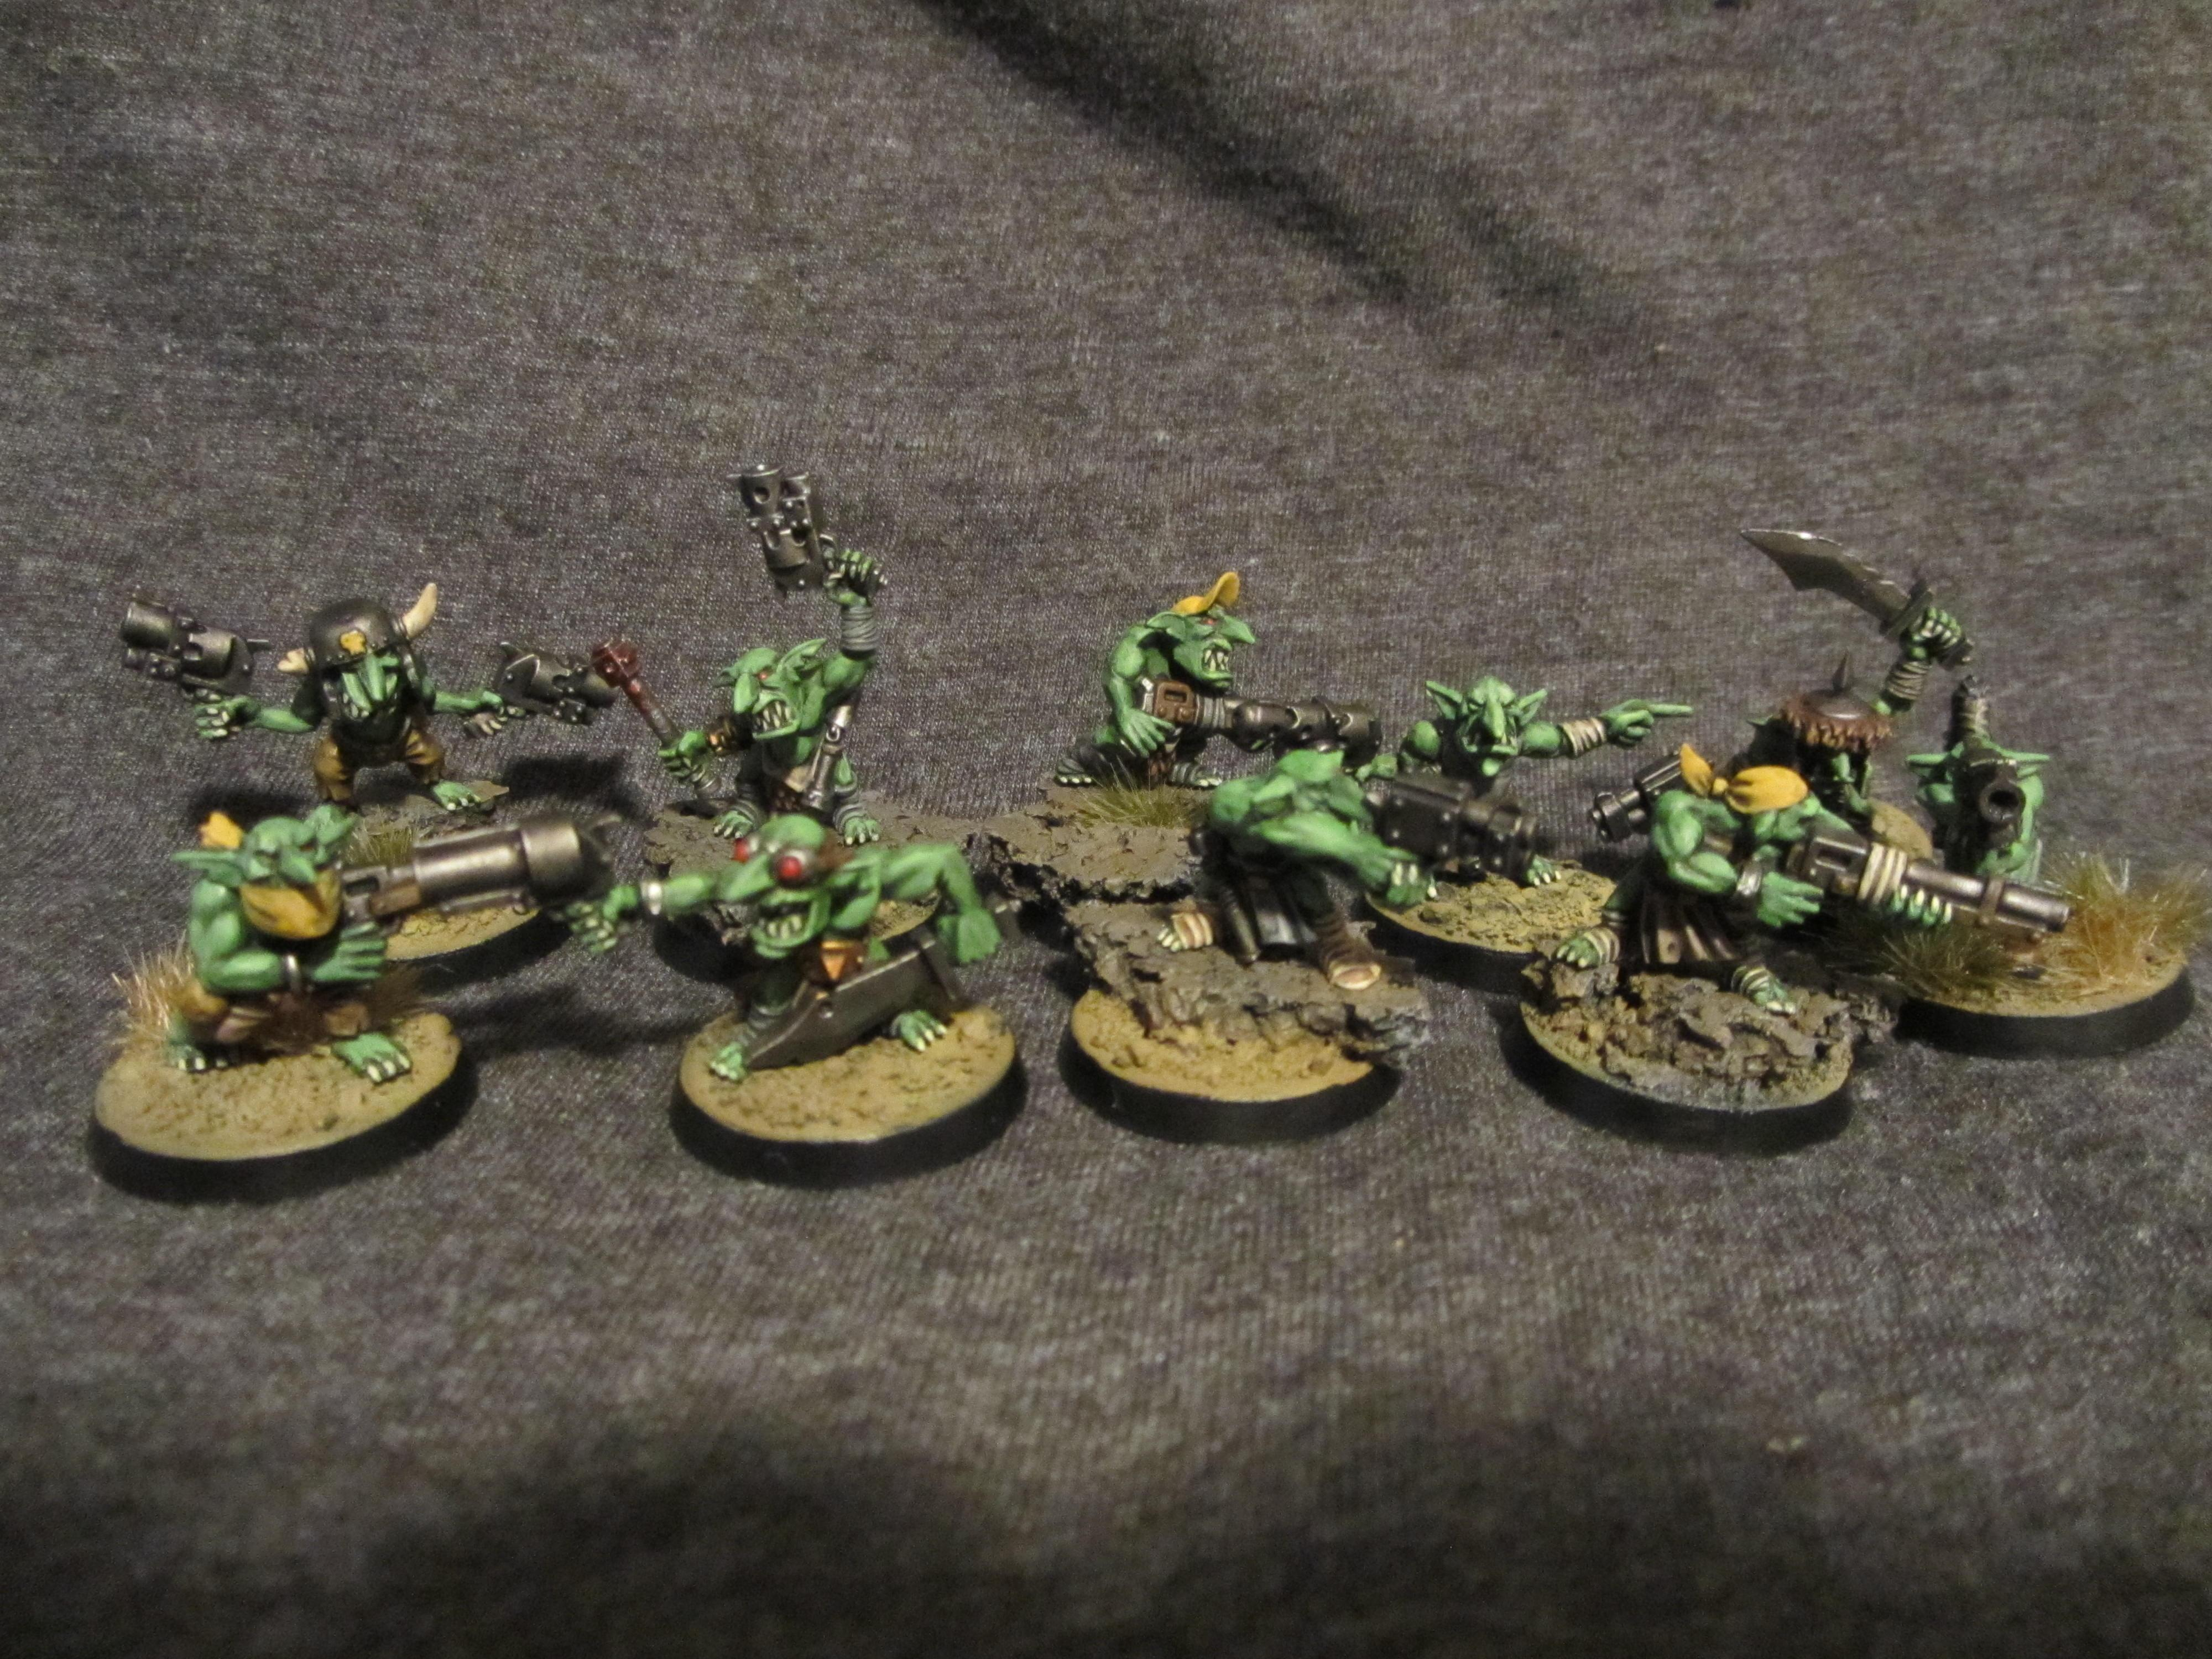 Gretchin, Grots, Orks, Warhammer 40,000